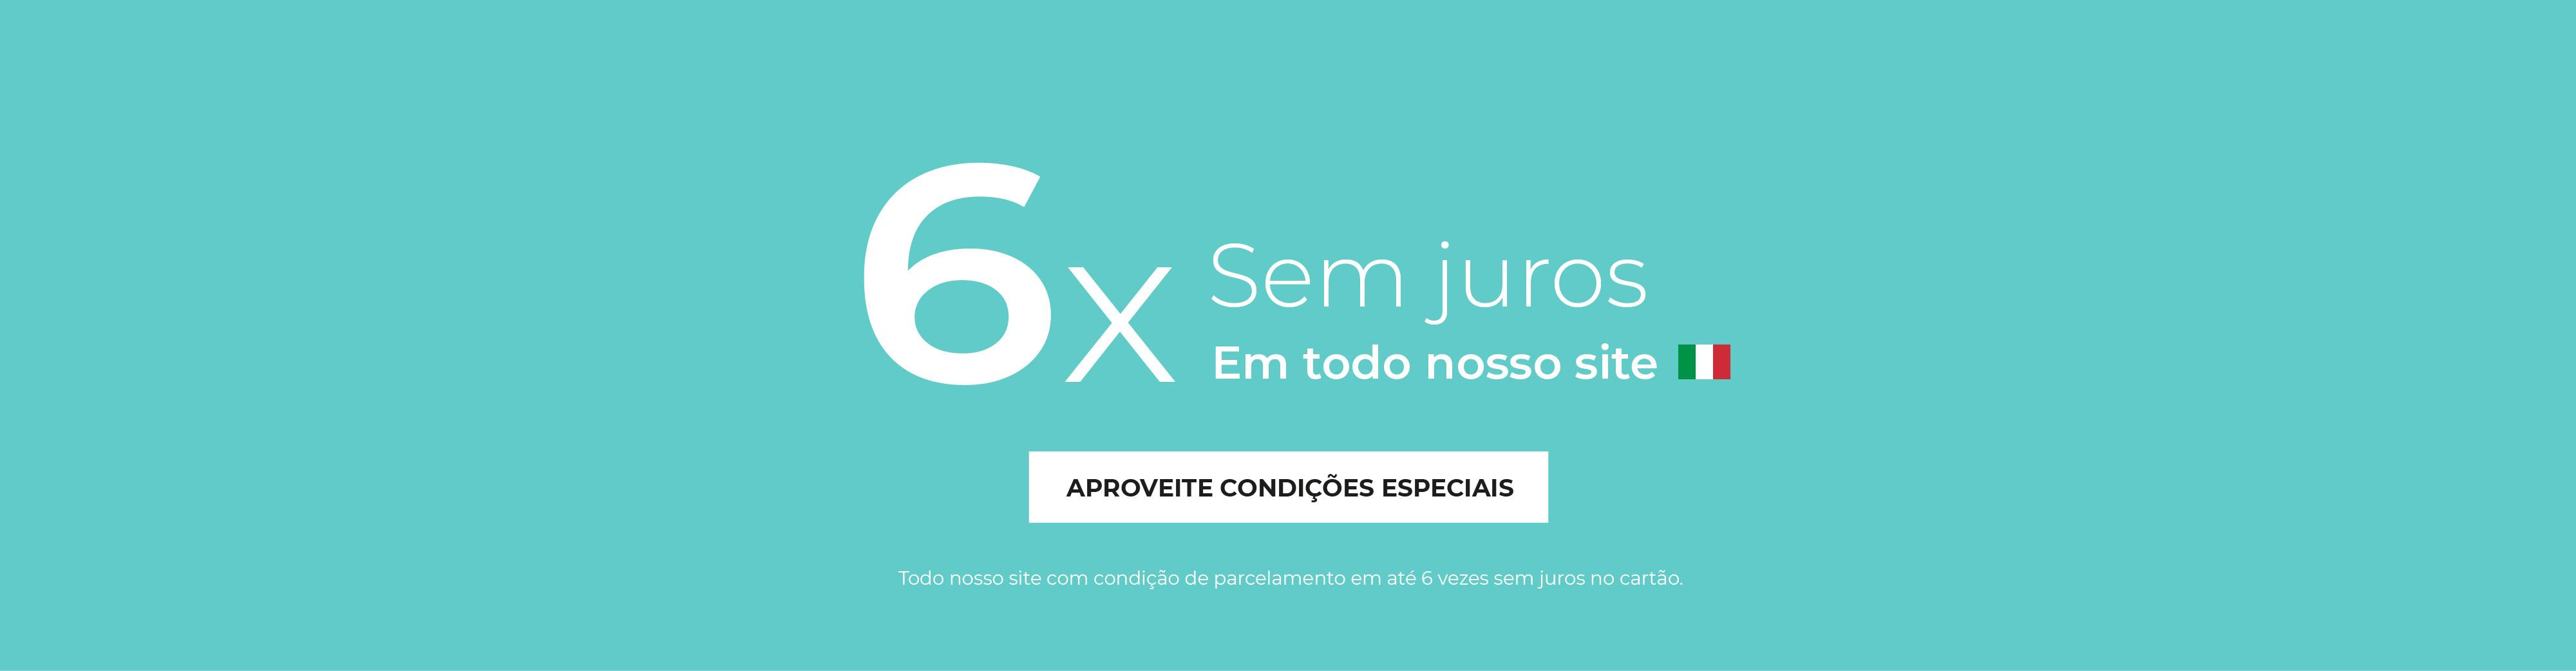 6X SEM JUROS FULL